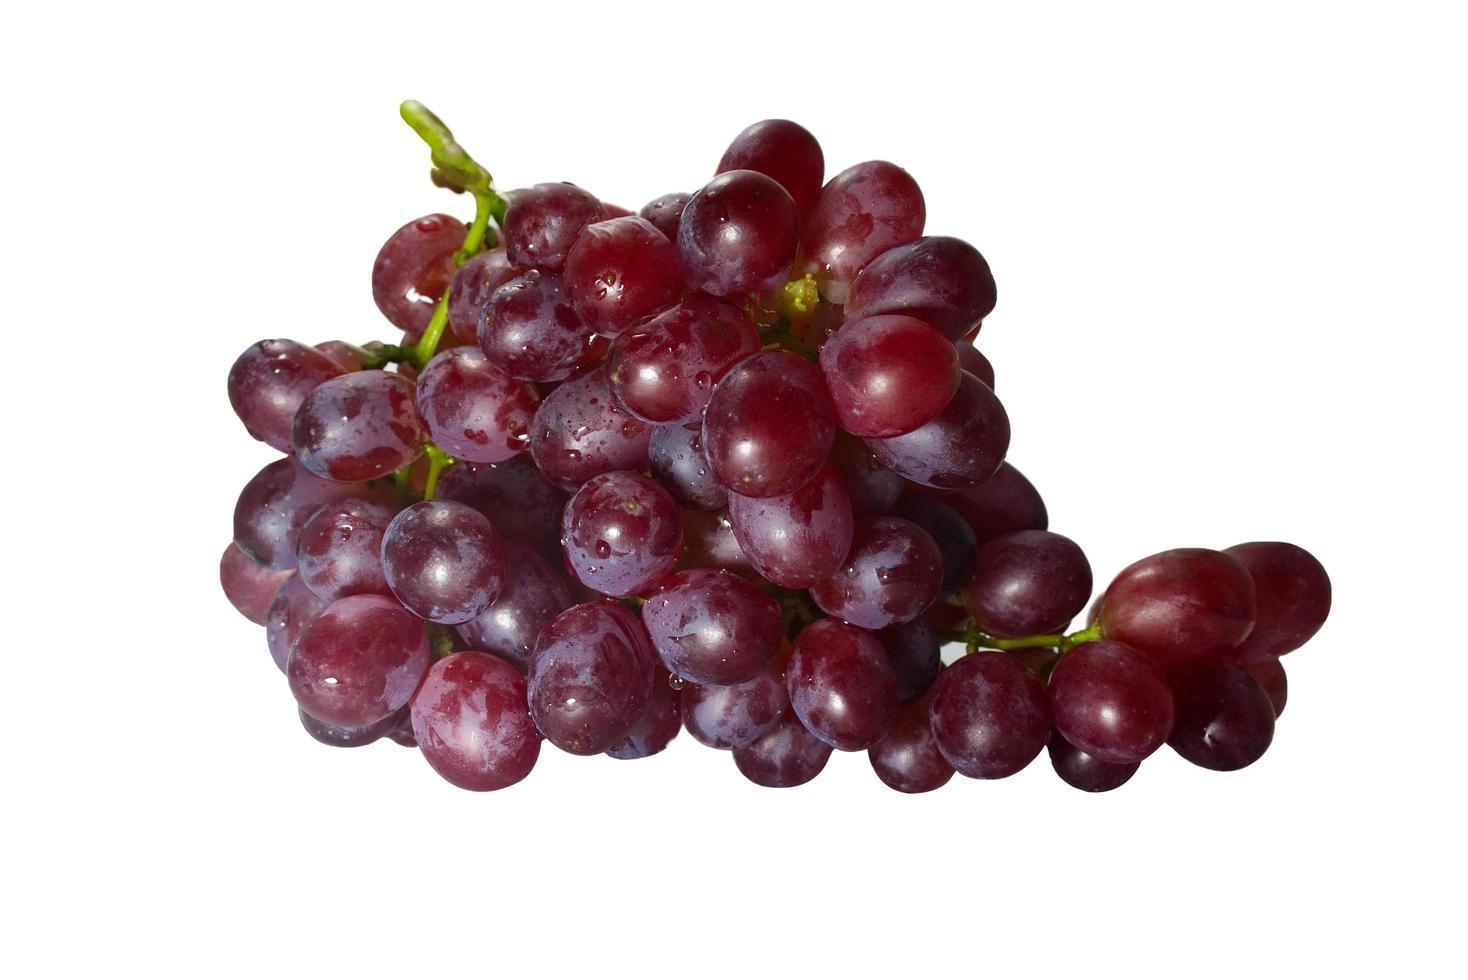 röda druvor på en vit bakgrund foto